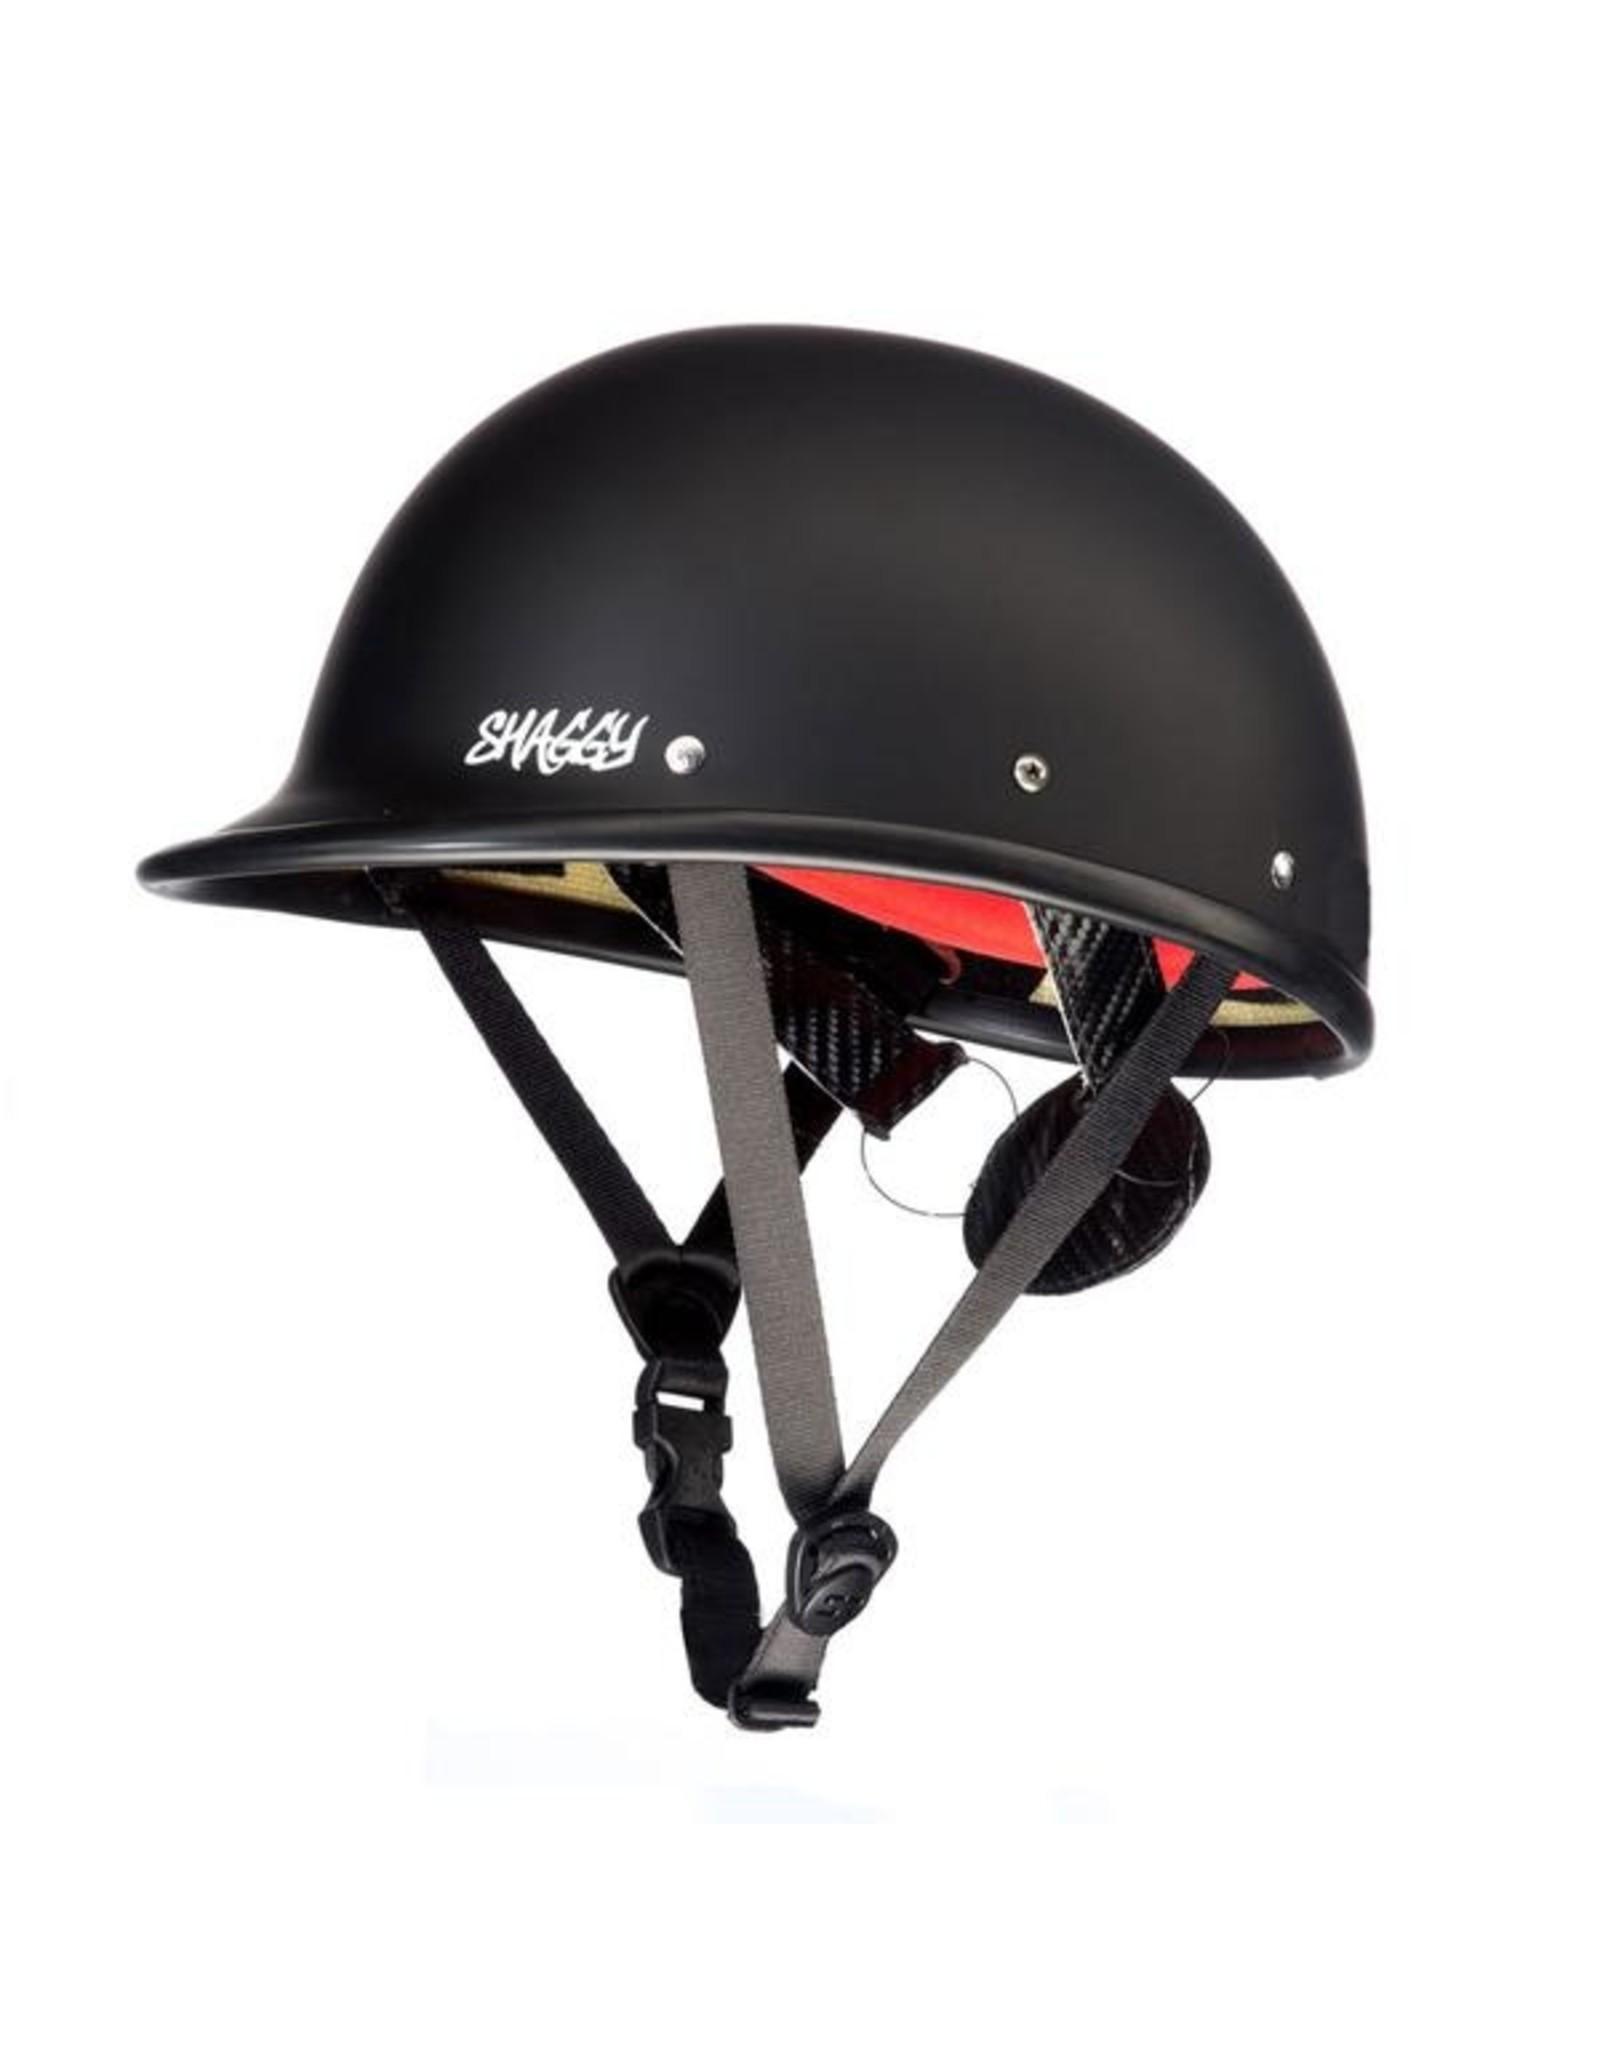 Shred Ready Shred Ready Shaggy Helmet